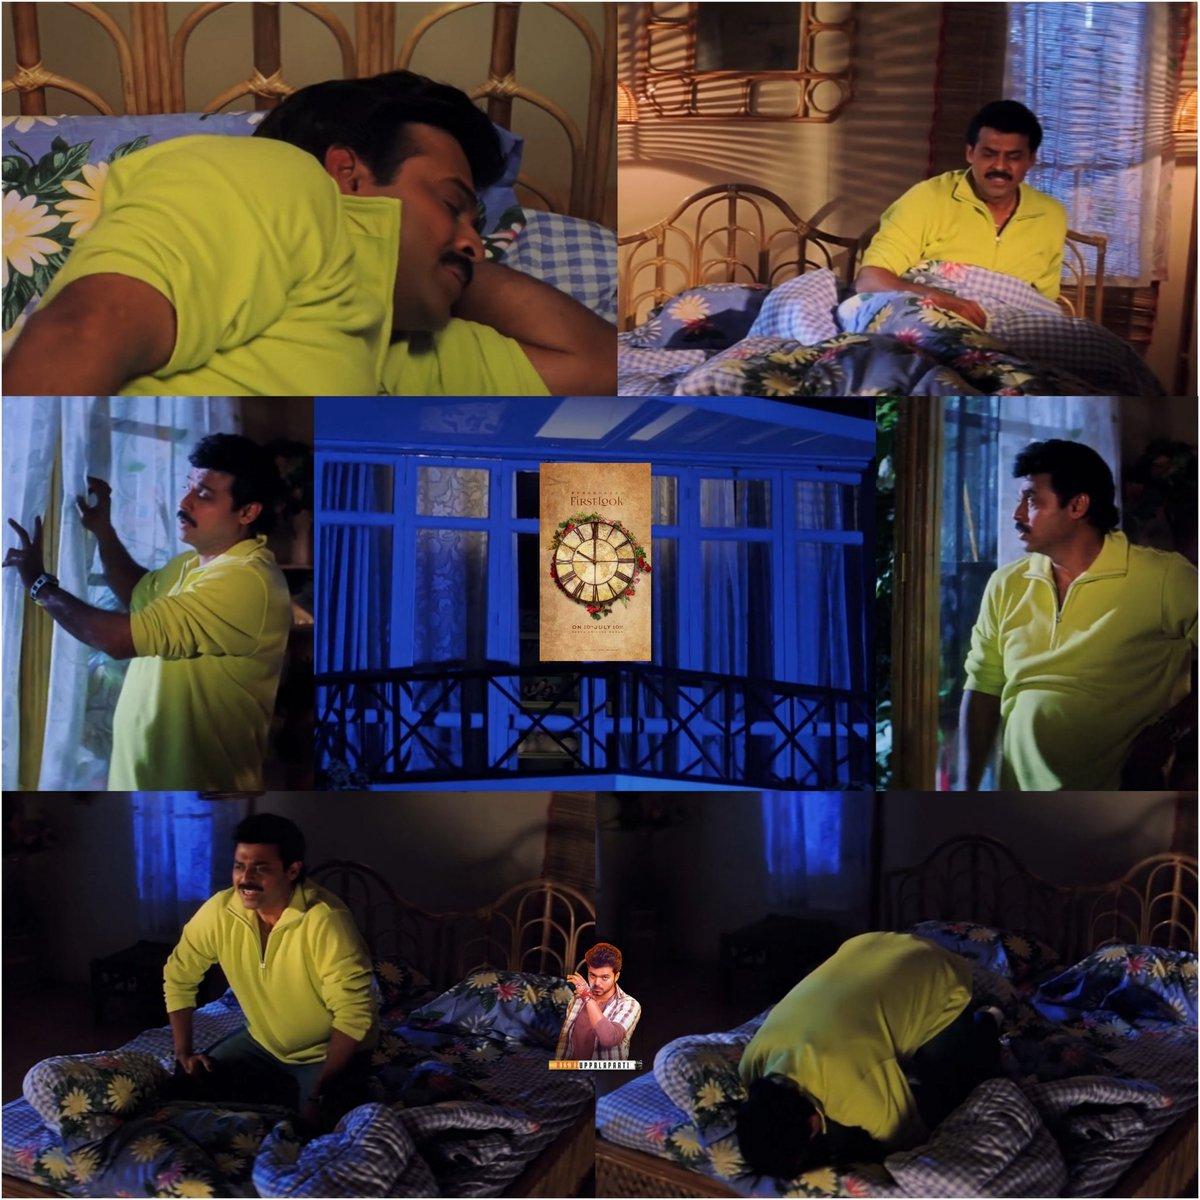 Me right now   When I saw darling  post and uv activeness   I can't sleep now God  #5YearsForBaahubaliRoar #Prabhas #Prabhas20 #Prabhas20FirstLookpic.twitter.com/BMCWNHIWoD